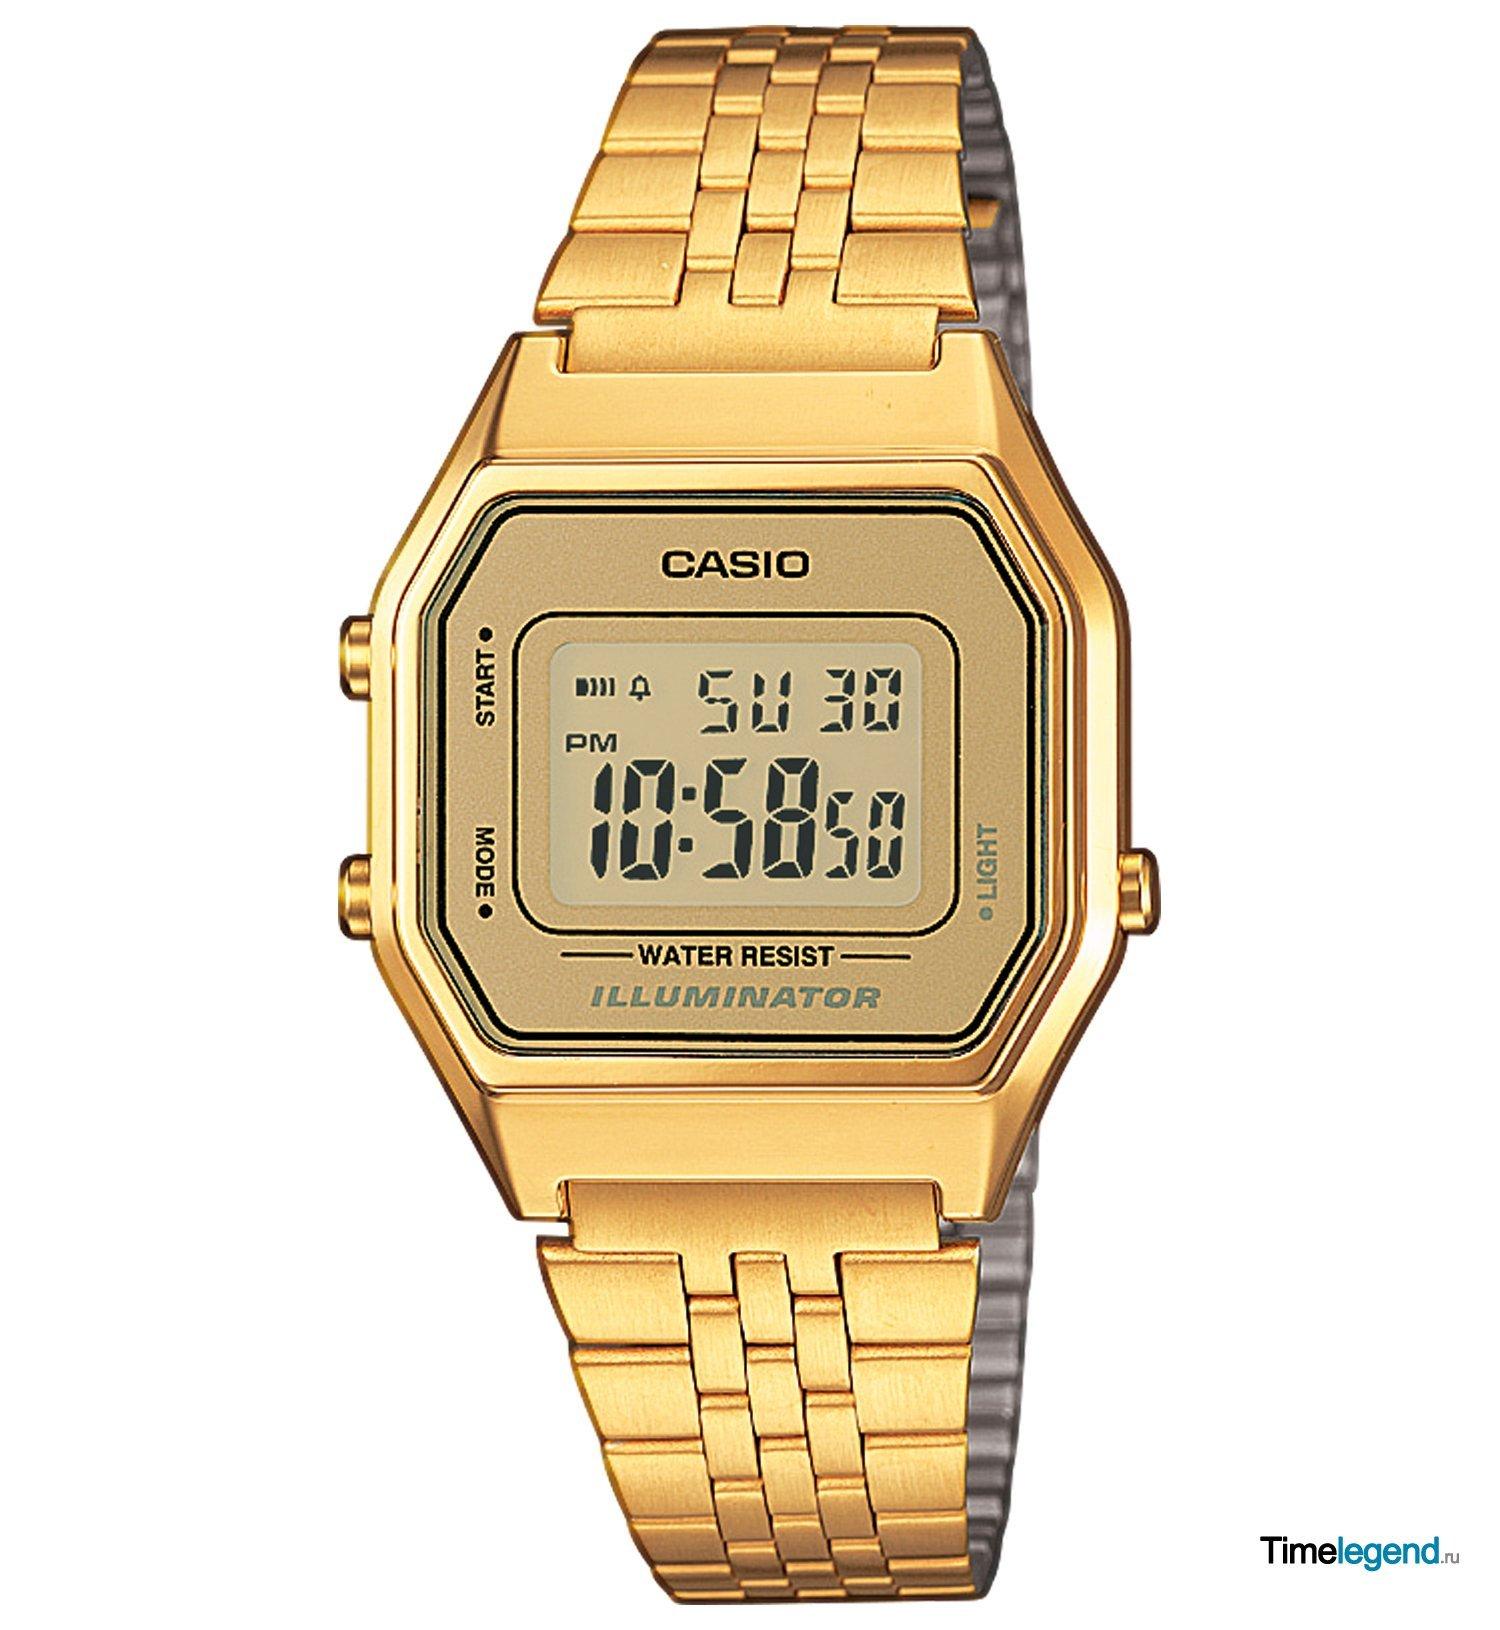 Casio Collection LA680WEGA-9E / LA680WEGA-9ER -  наручные часыCasio<br><br><br>Бренд: Casio<br>Модель: Casio LA680WEGA-9E<br>Артикул: LA680WEGA-9E<br>Вариант артикула: LA680WEGA-9ER<br>Коллекция: Collection<br>Подколлекция: None<br>Страна: Япония<br>Пол: None<br>Тип механизма: None<br>Механизм: None<br>Количество камней: None<br>Автоподзавод: None<br>Источник энергии: None<br>Срок службы элемента питания: None<br>Дисплей: None<br>Цифры: None<br>Водозащита: None<br>Противоударные: None<br>Материал корпуса: None<br>Материал браслета: None<br>Материал безеля: None<br>Стекло: None<br>Антибликовое покрытие: None<br>Цвет корпуса: None<br>Цвет браслета: None<br>Цвет циферблата: None<br>Цвет безеля: None<br>Размеры: None<br>Диаметр: None<br>Диаметр корпуса: None<br>Толщина: None<br>Ширина ремешка: None<br>Вес: None<br>Спорт-функции: None<br>Подсветка: None<br>Вставка: None<br>Отображение даты: None<br>Хронограф: None<br>Таймер: None<br>Термометр: None<br>Хронометр: None<br>GPS: None<br>Радиосинхронизация: None<br>Барометр: None<br>Скелетон: None<br>Дополнительная информация: None<br>Дополнительные функции: None